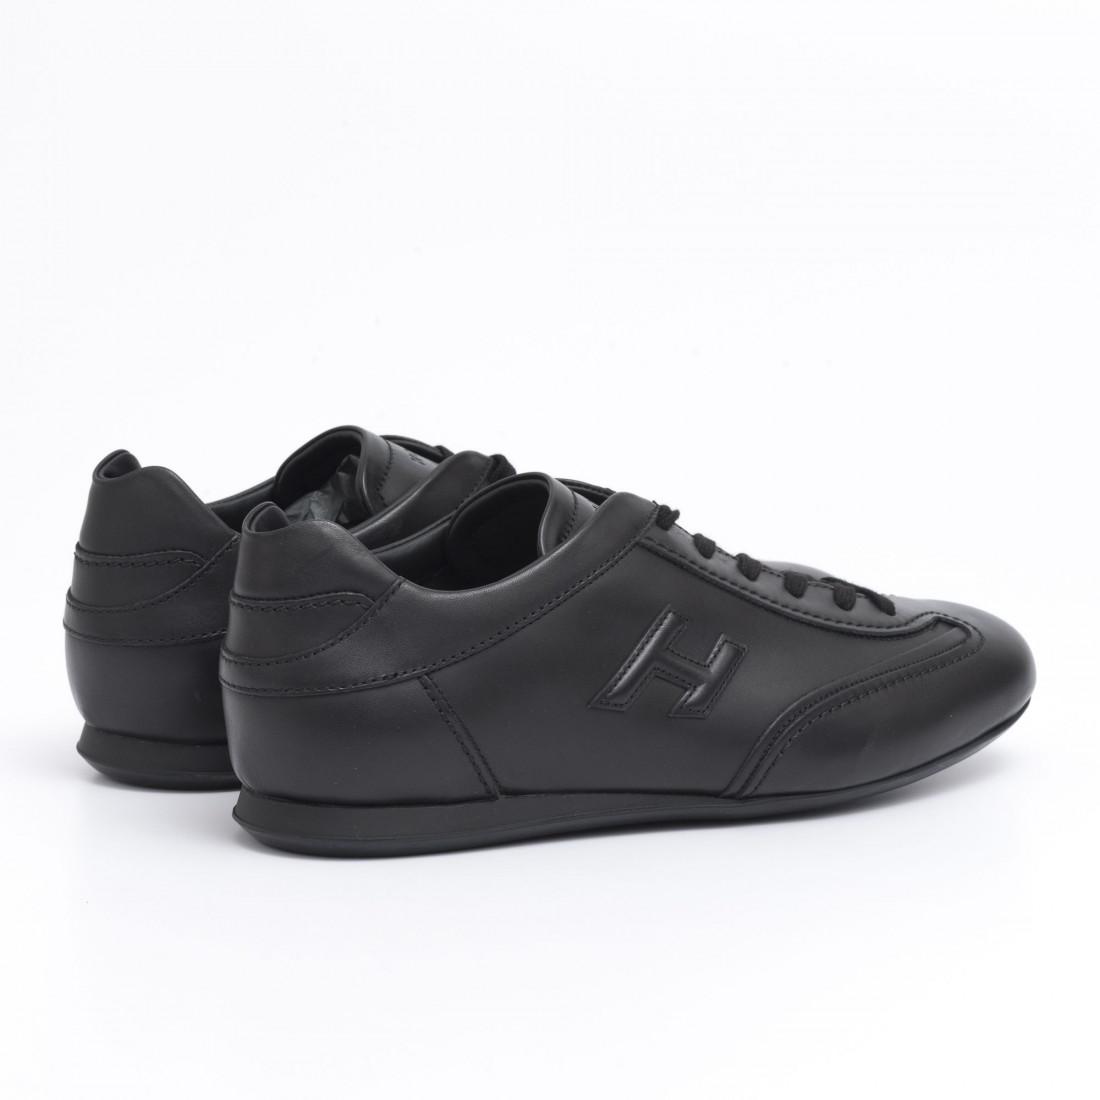 sneakers uomo hogan hxm0570i9721pob999 2450